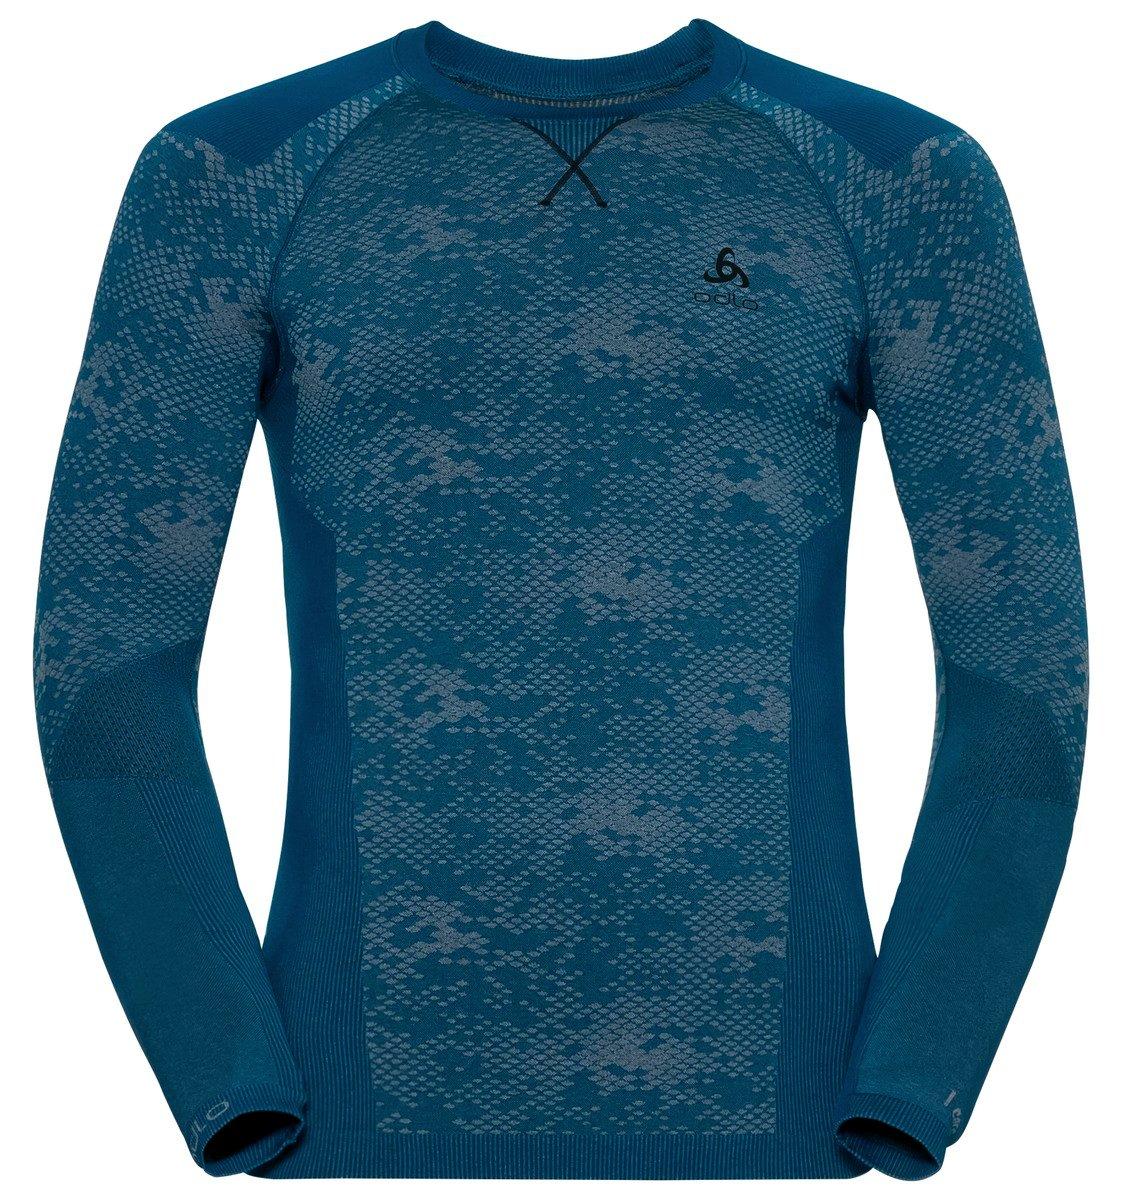 Odlo BLACKCOMP Evolution Warm Baselayer Shirt - blau